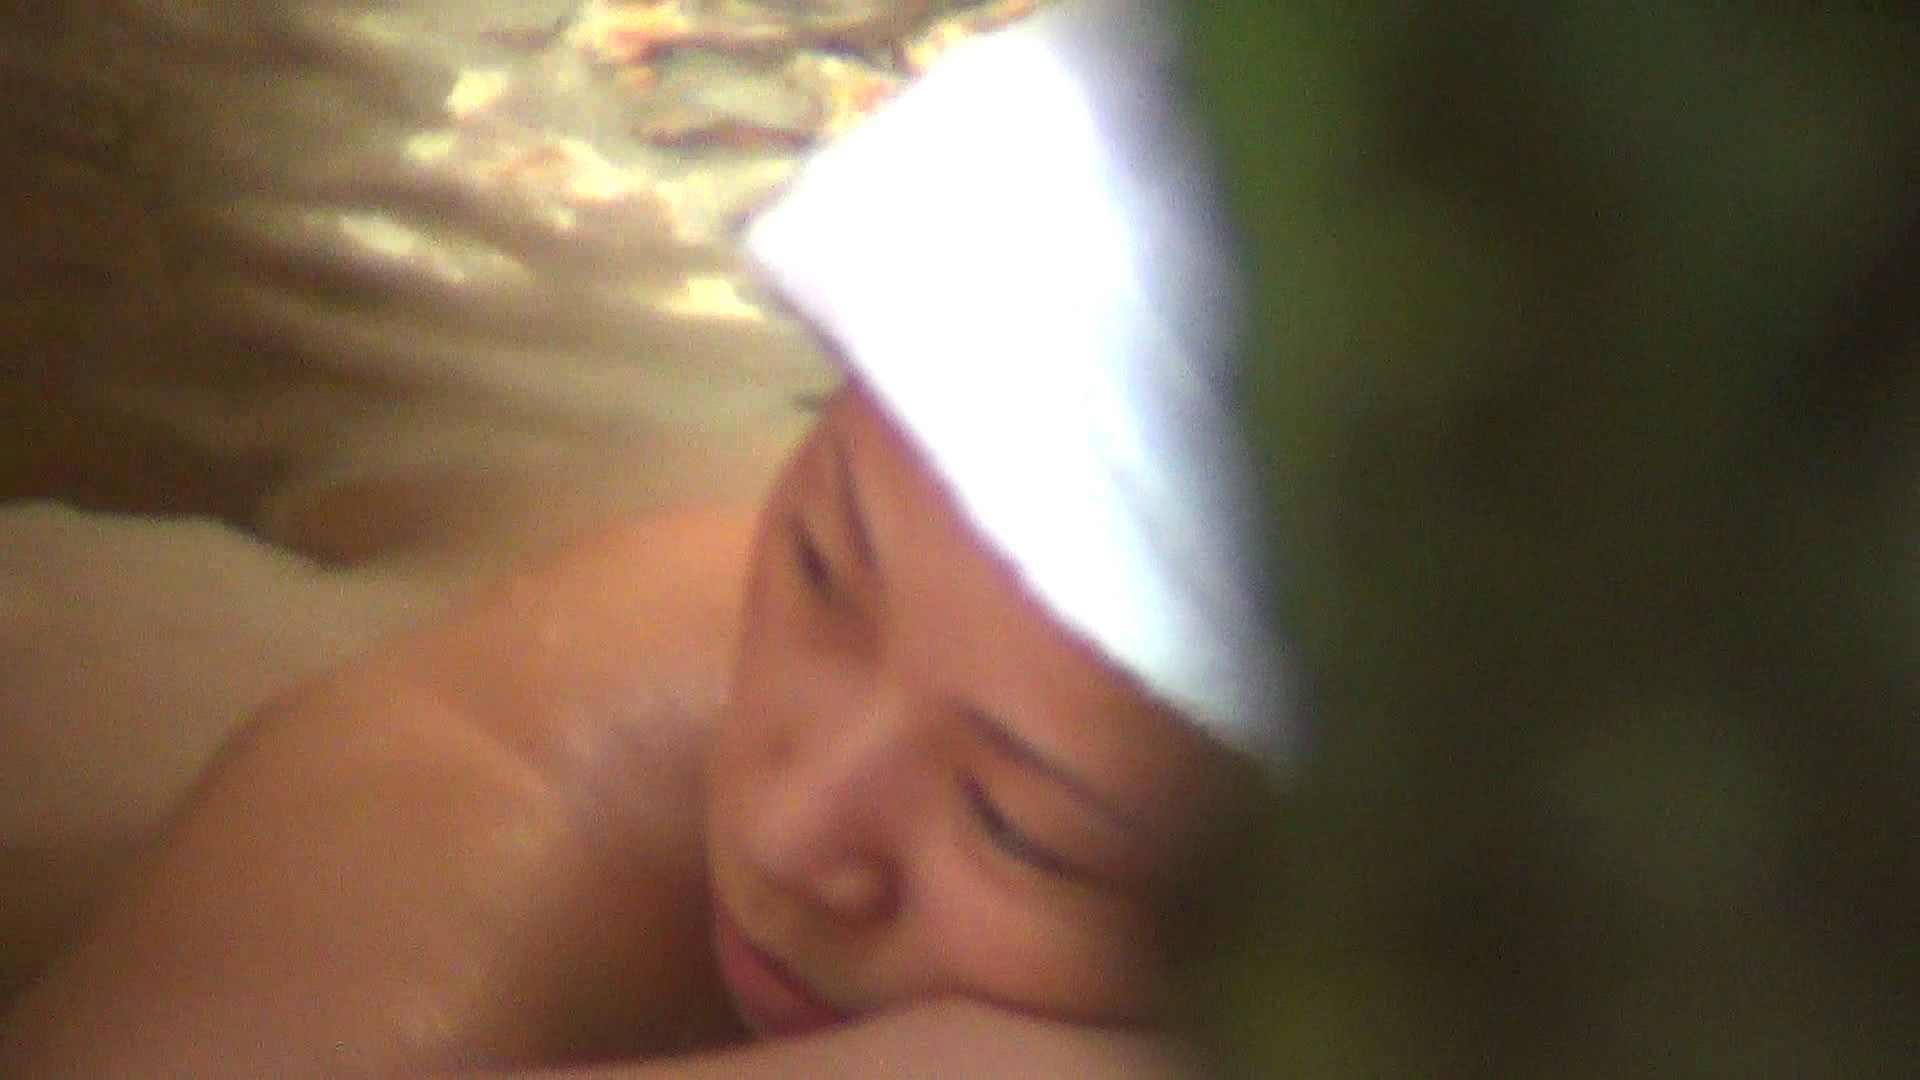 Vol.51 醤油j顔のお女市さん 胸の割りに下半身はがっちりタイプ 美女  112PIX 42